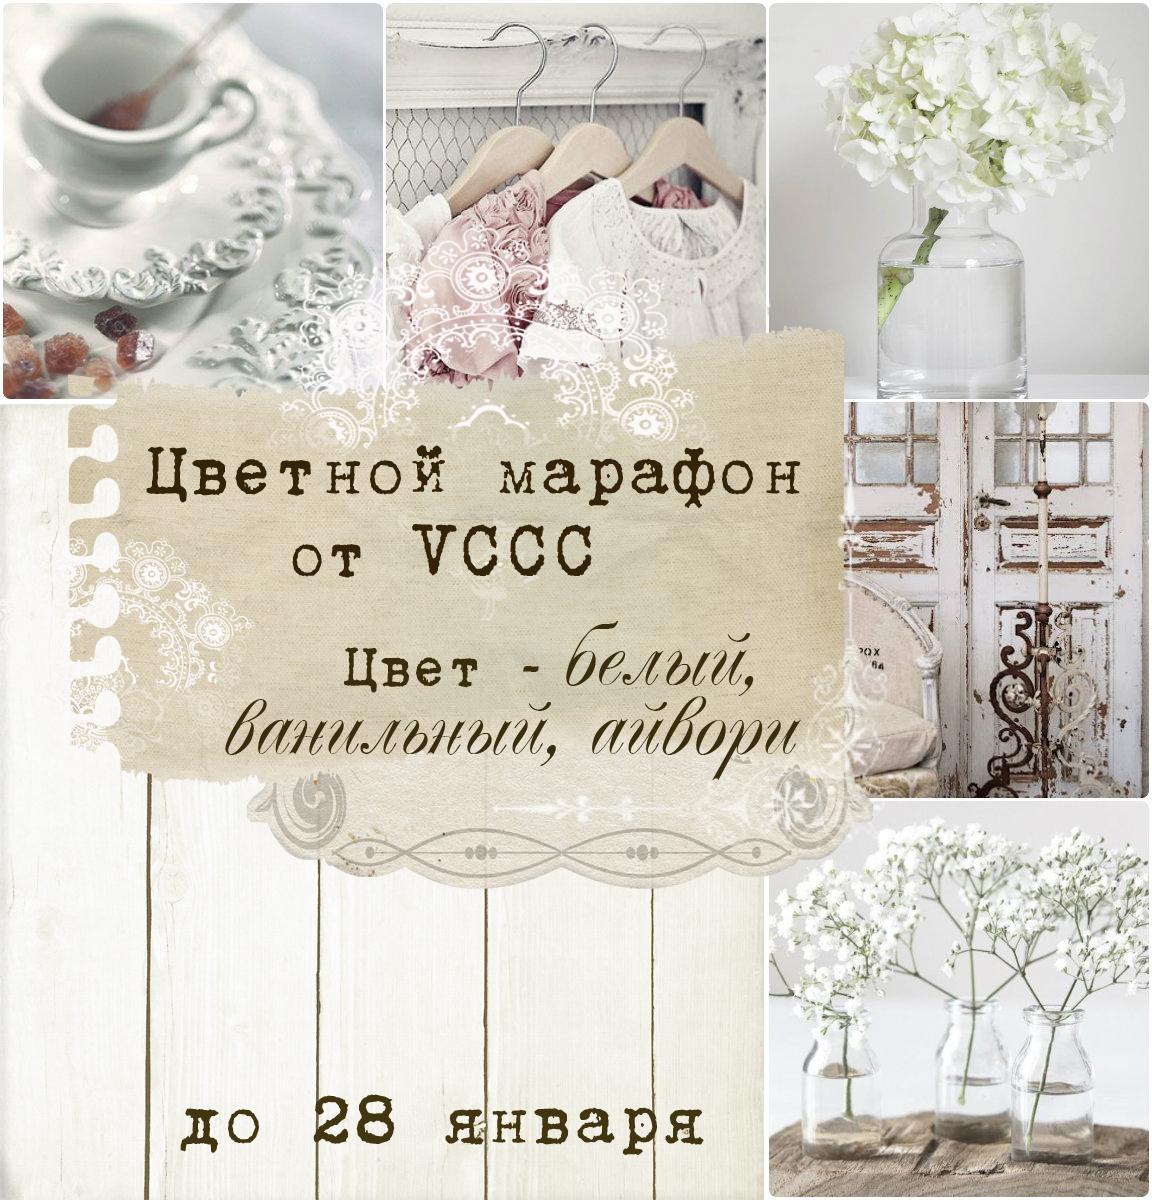 http://vintagecafecard.blogspot.com/2015/01/2.html